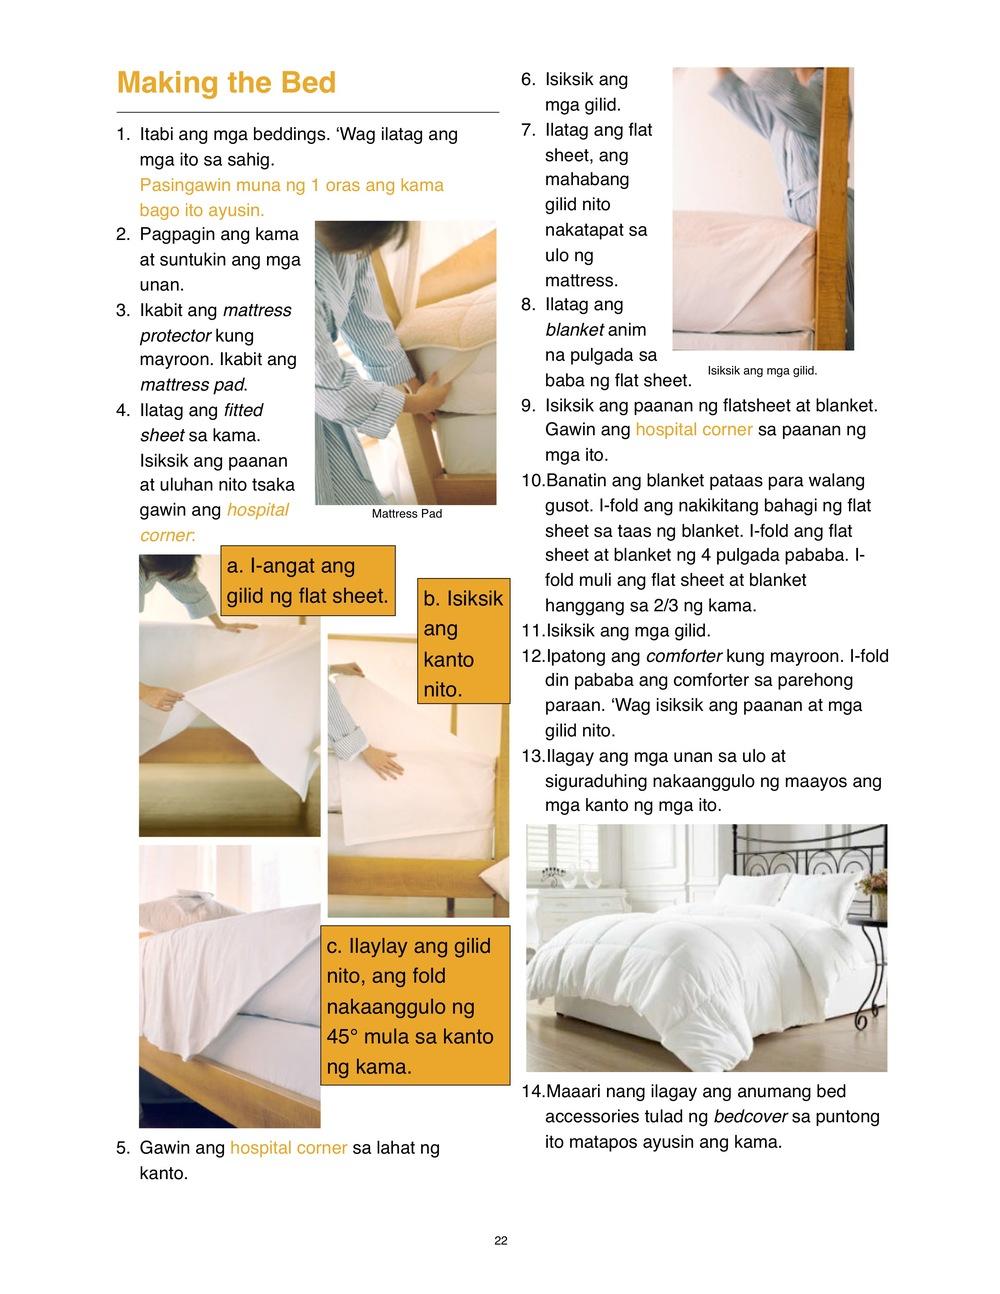 MaidProvider.ph Training Manual NO WATERMARK.pdf 24.jpeg